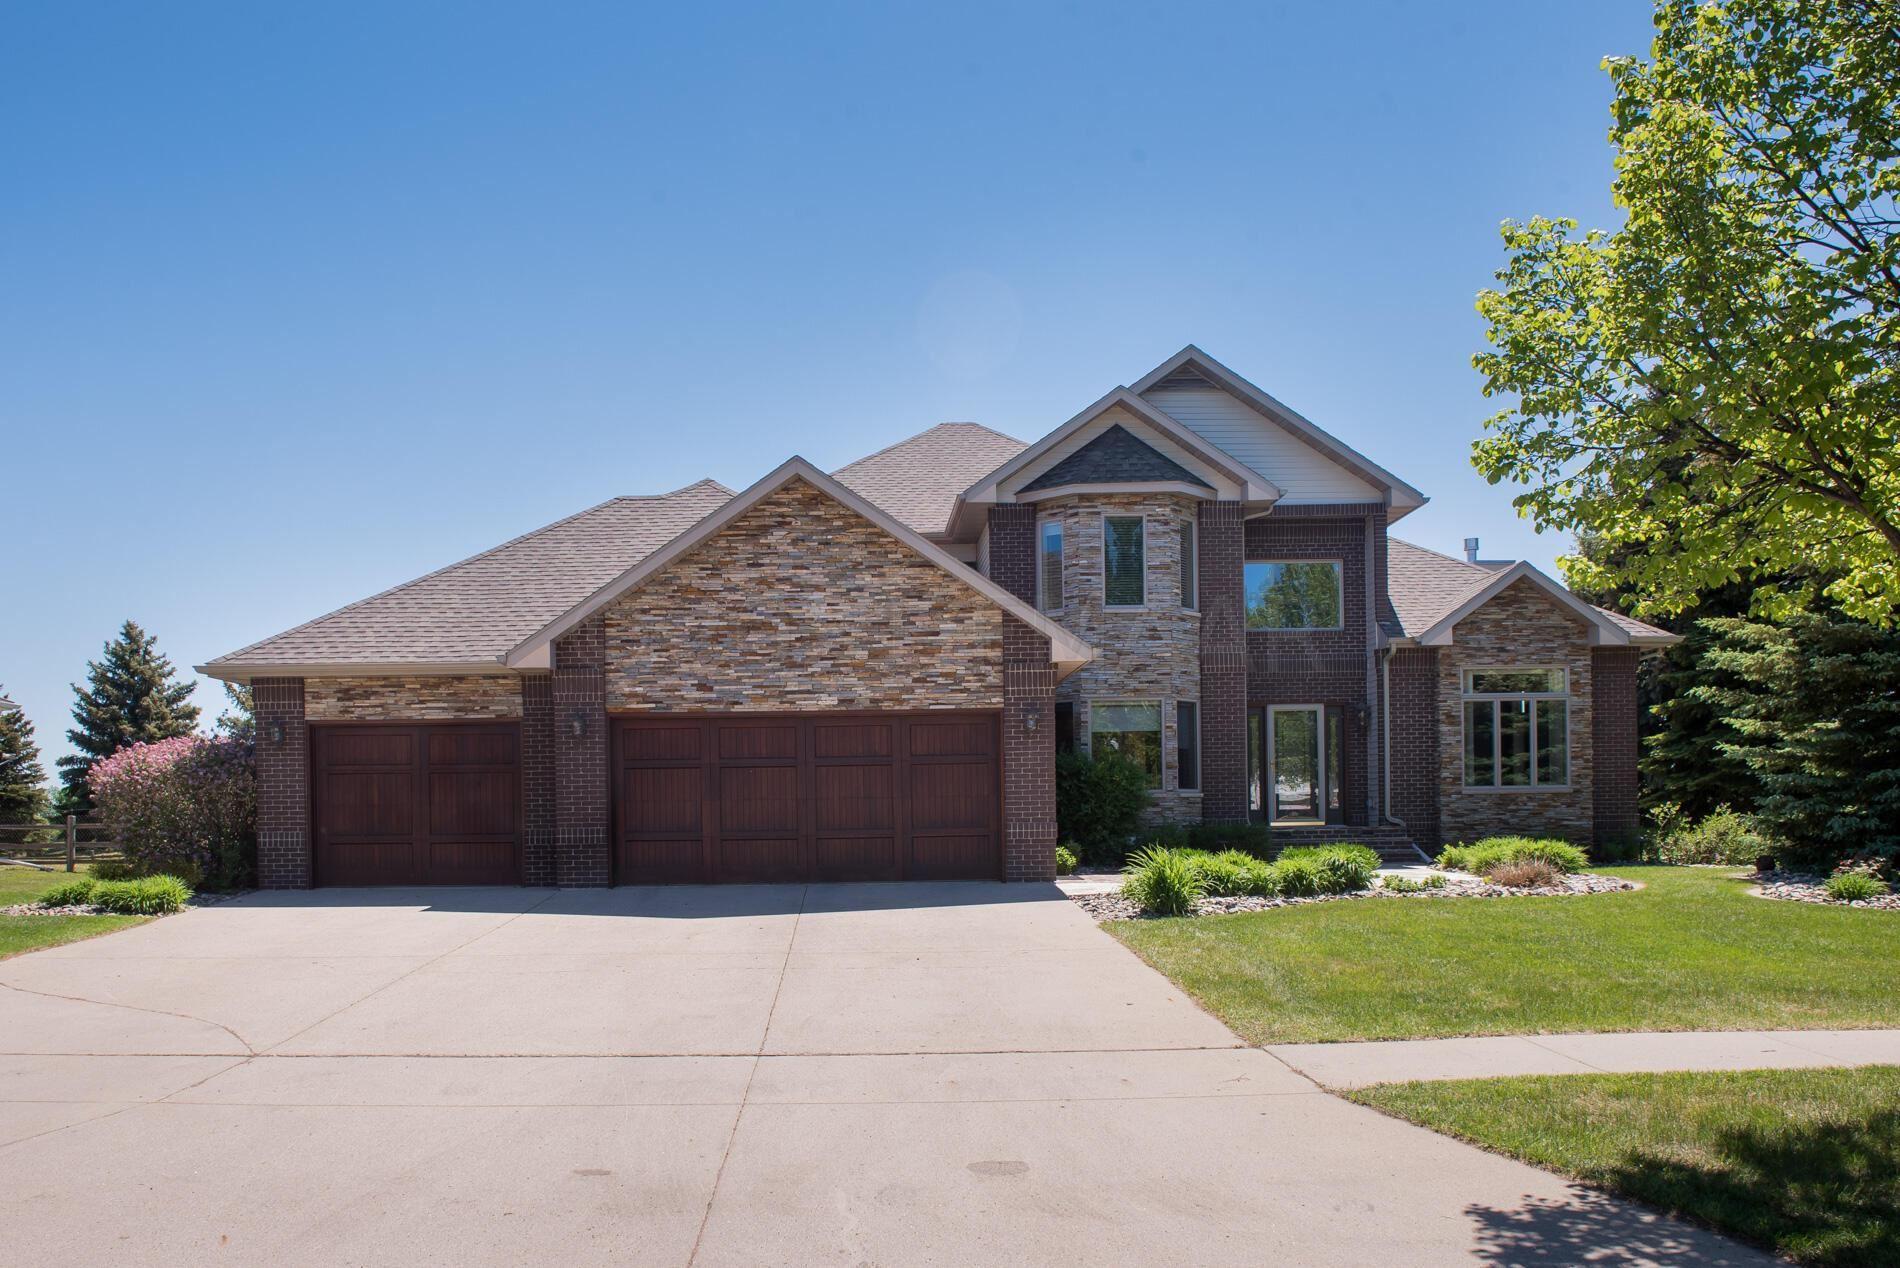 4750 Rose Creek S, Fargo, ND 58104 - #: 21-2914